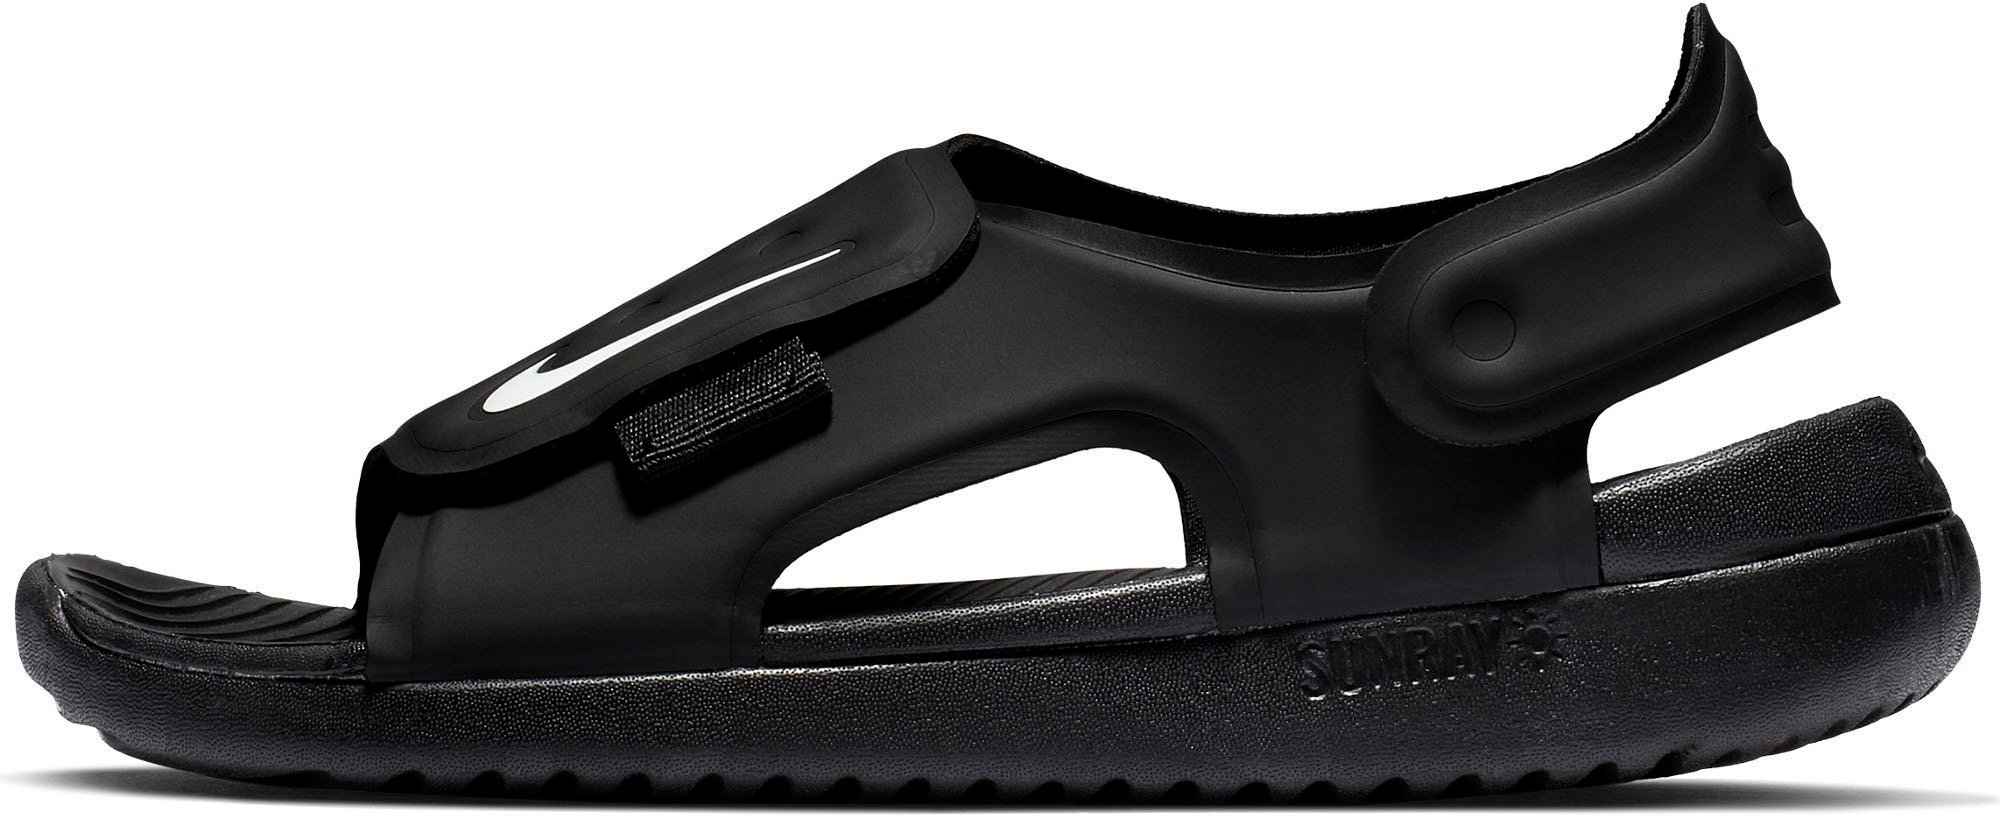 Nike badslippers »Sunray Adjust 5« goedkoop op otto.nl kopen